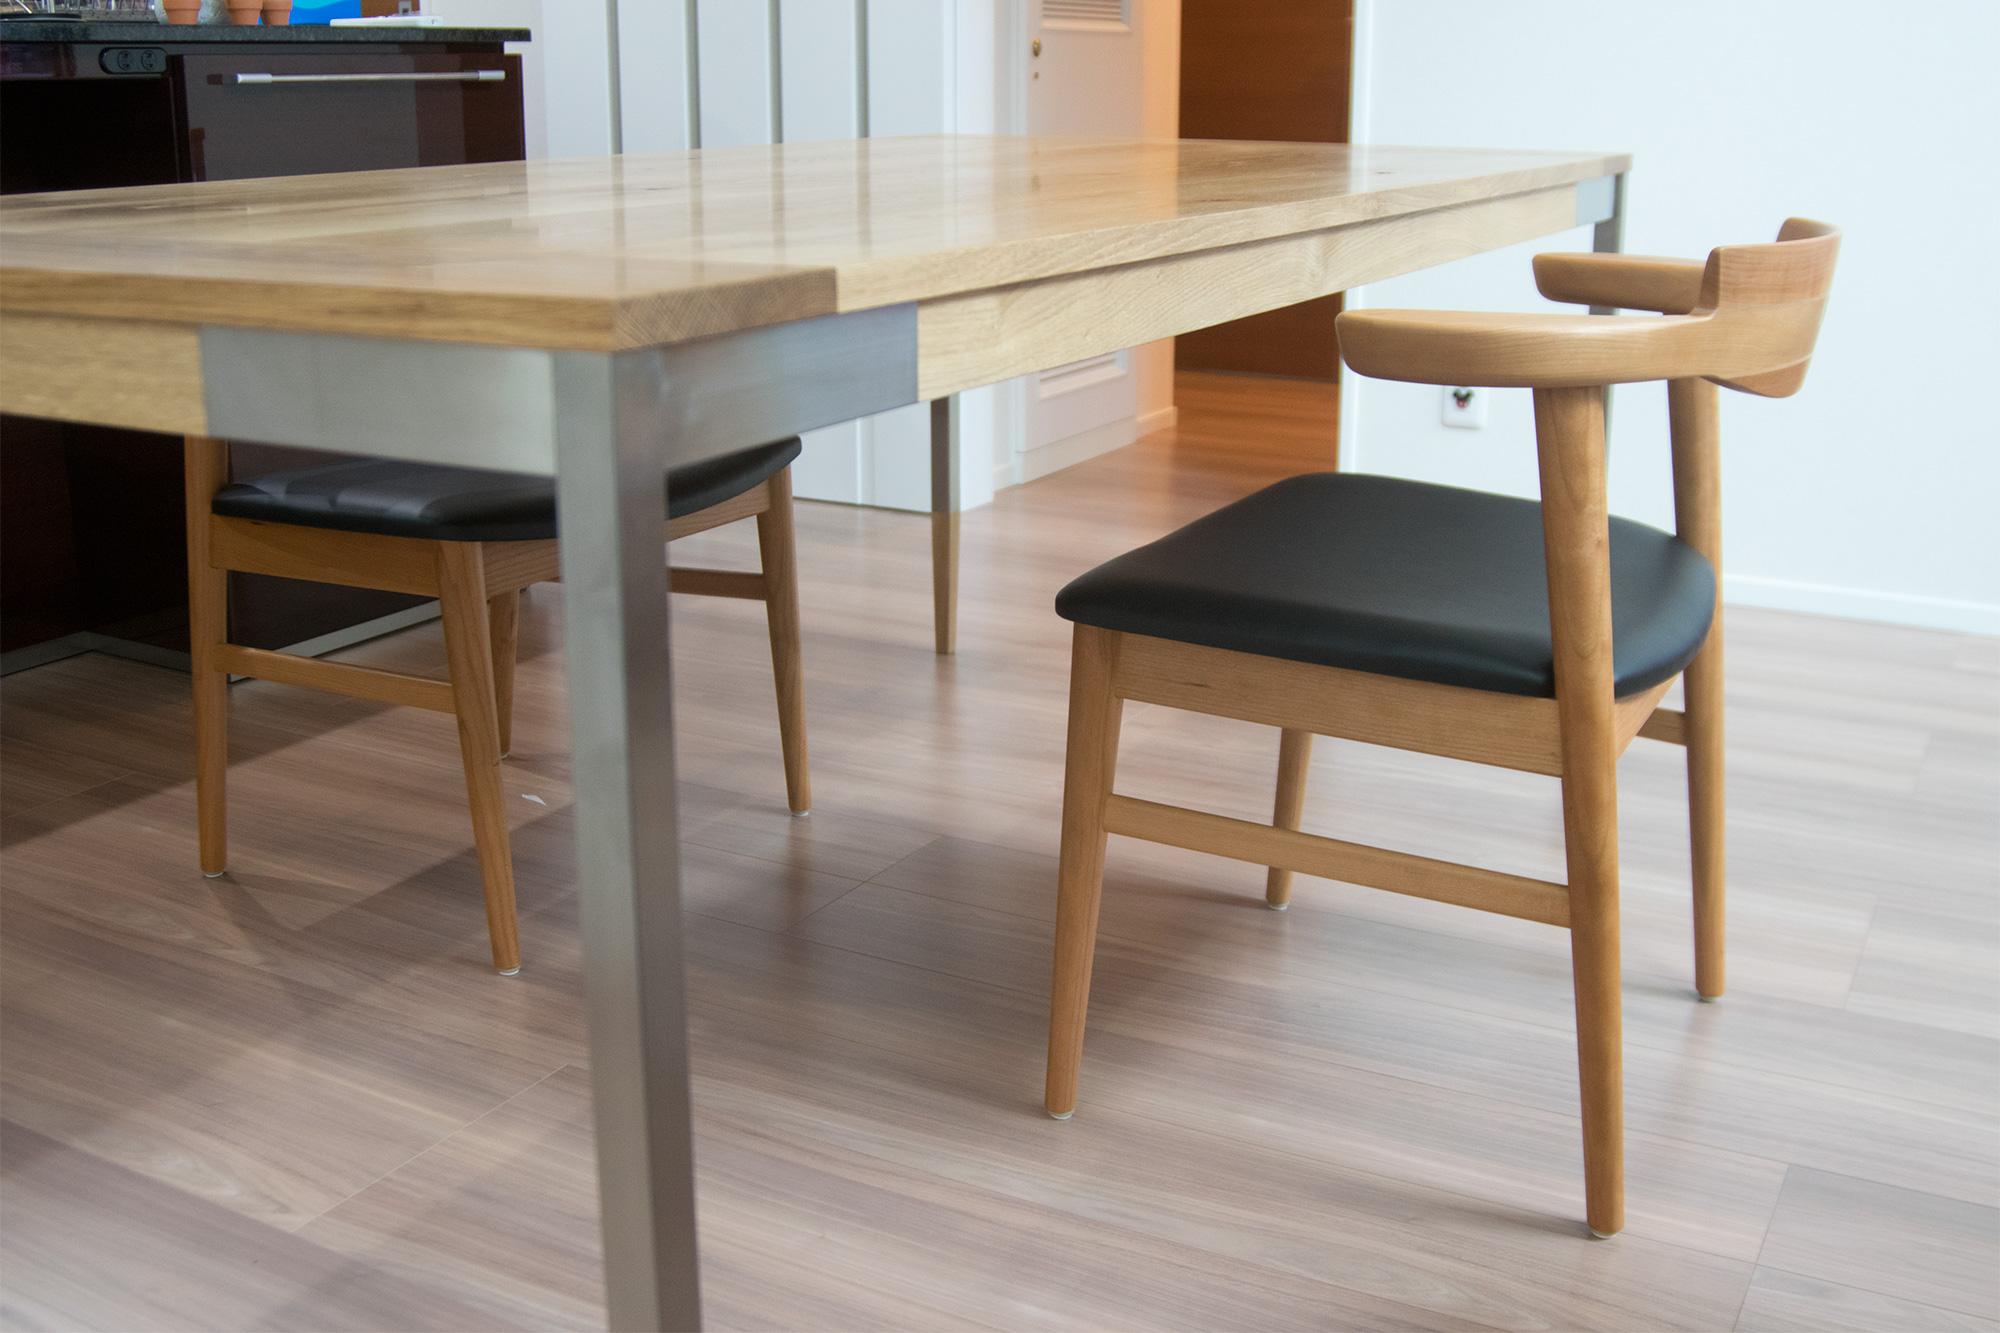 ALTERNATIVE TABLE